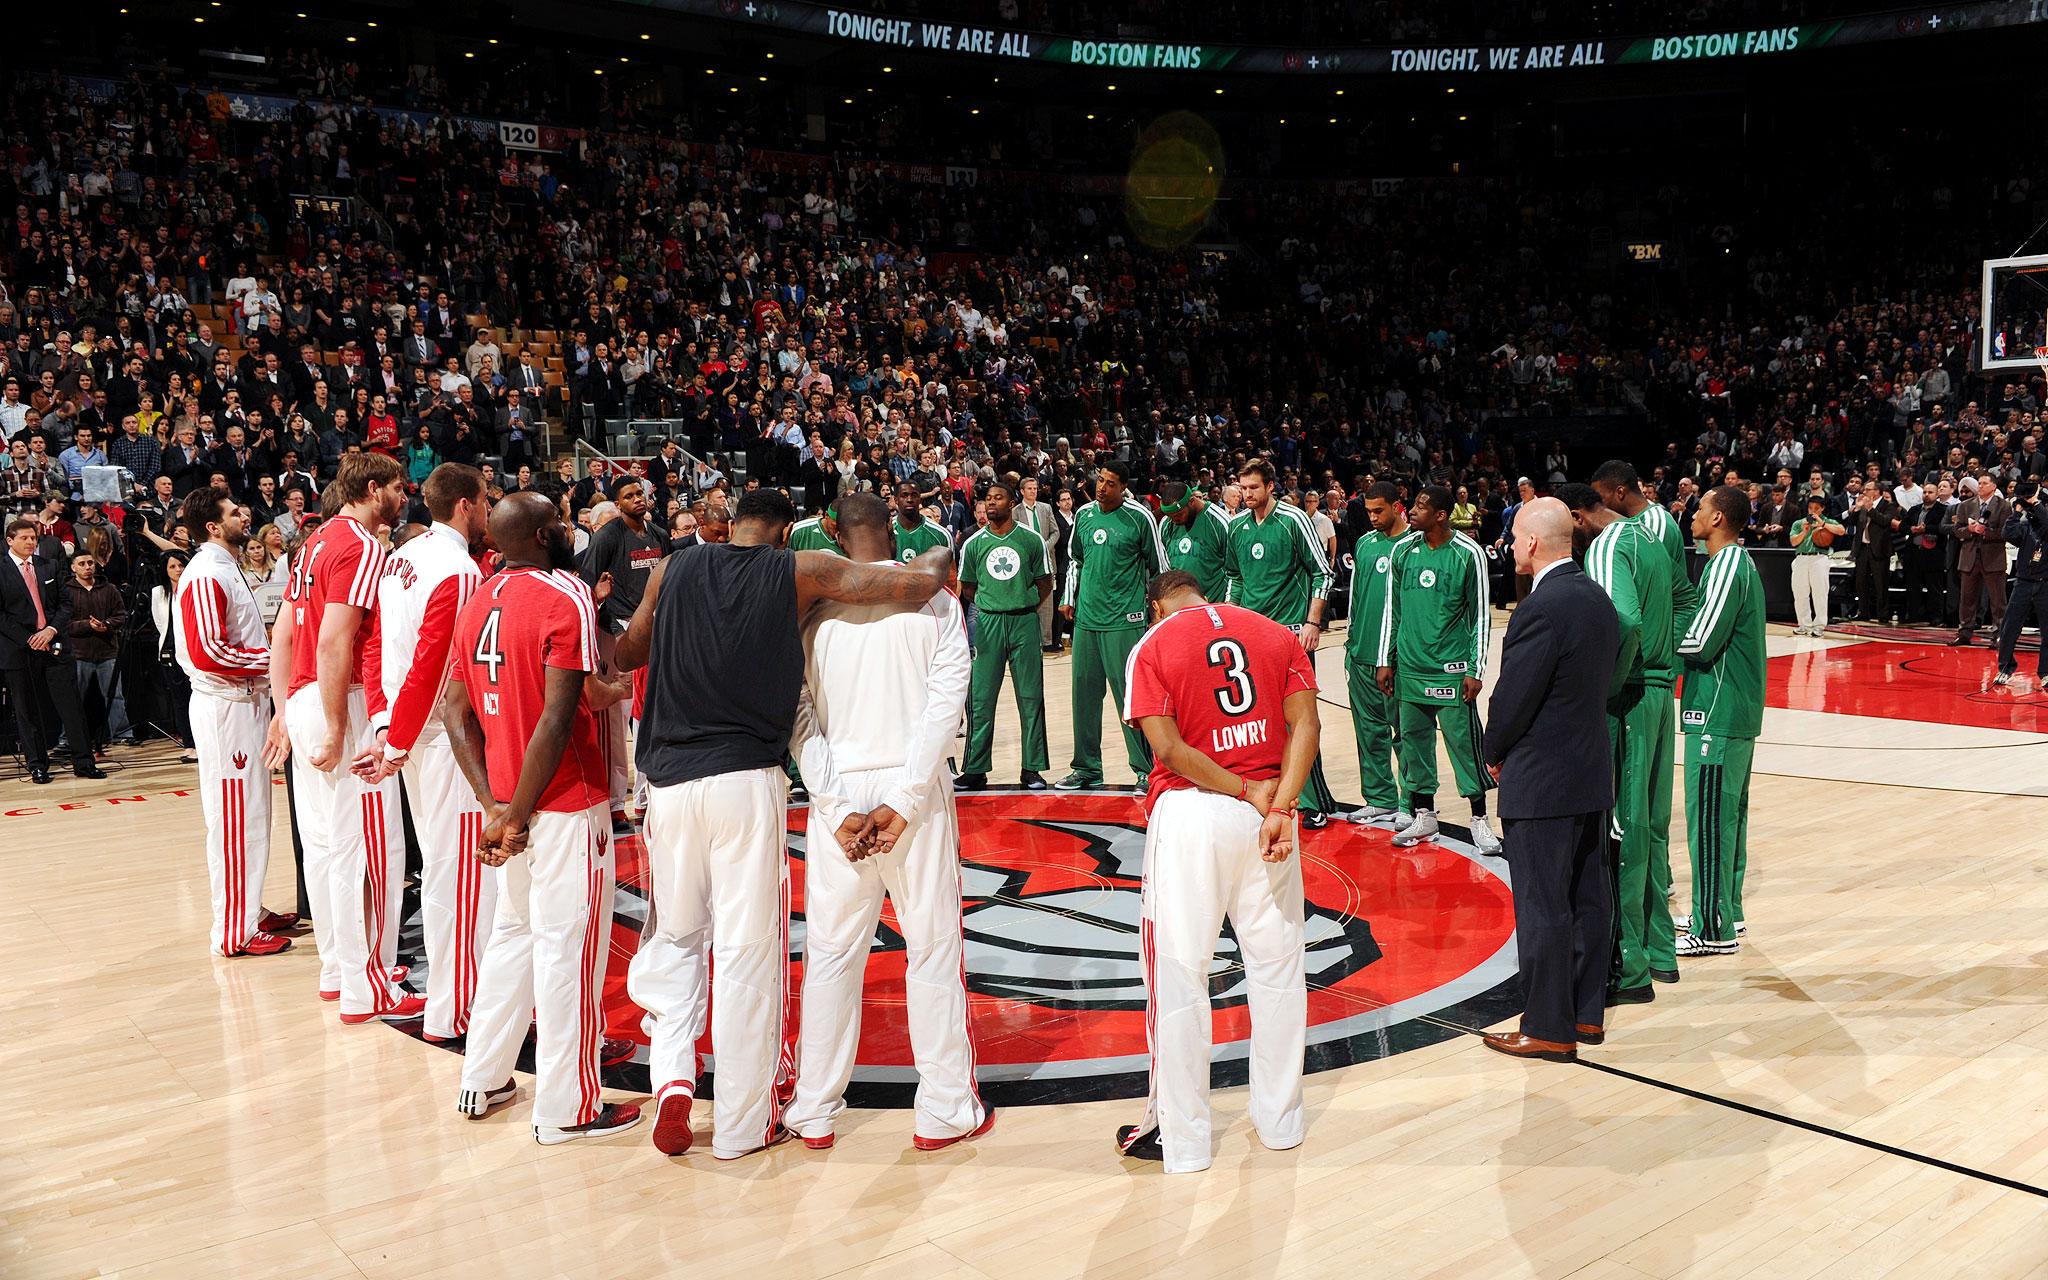 Raptors/Celtics